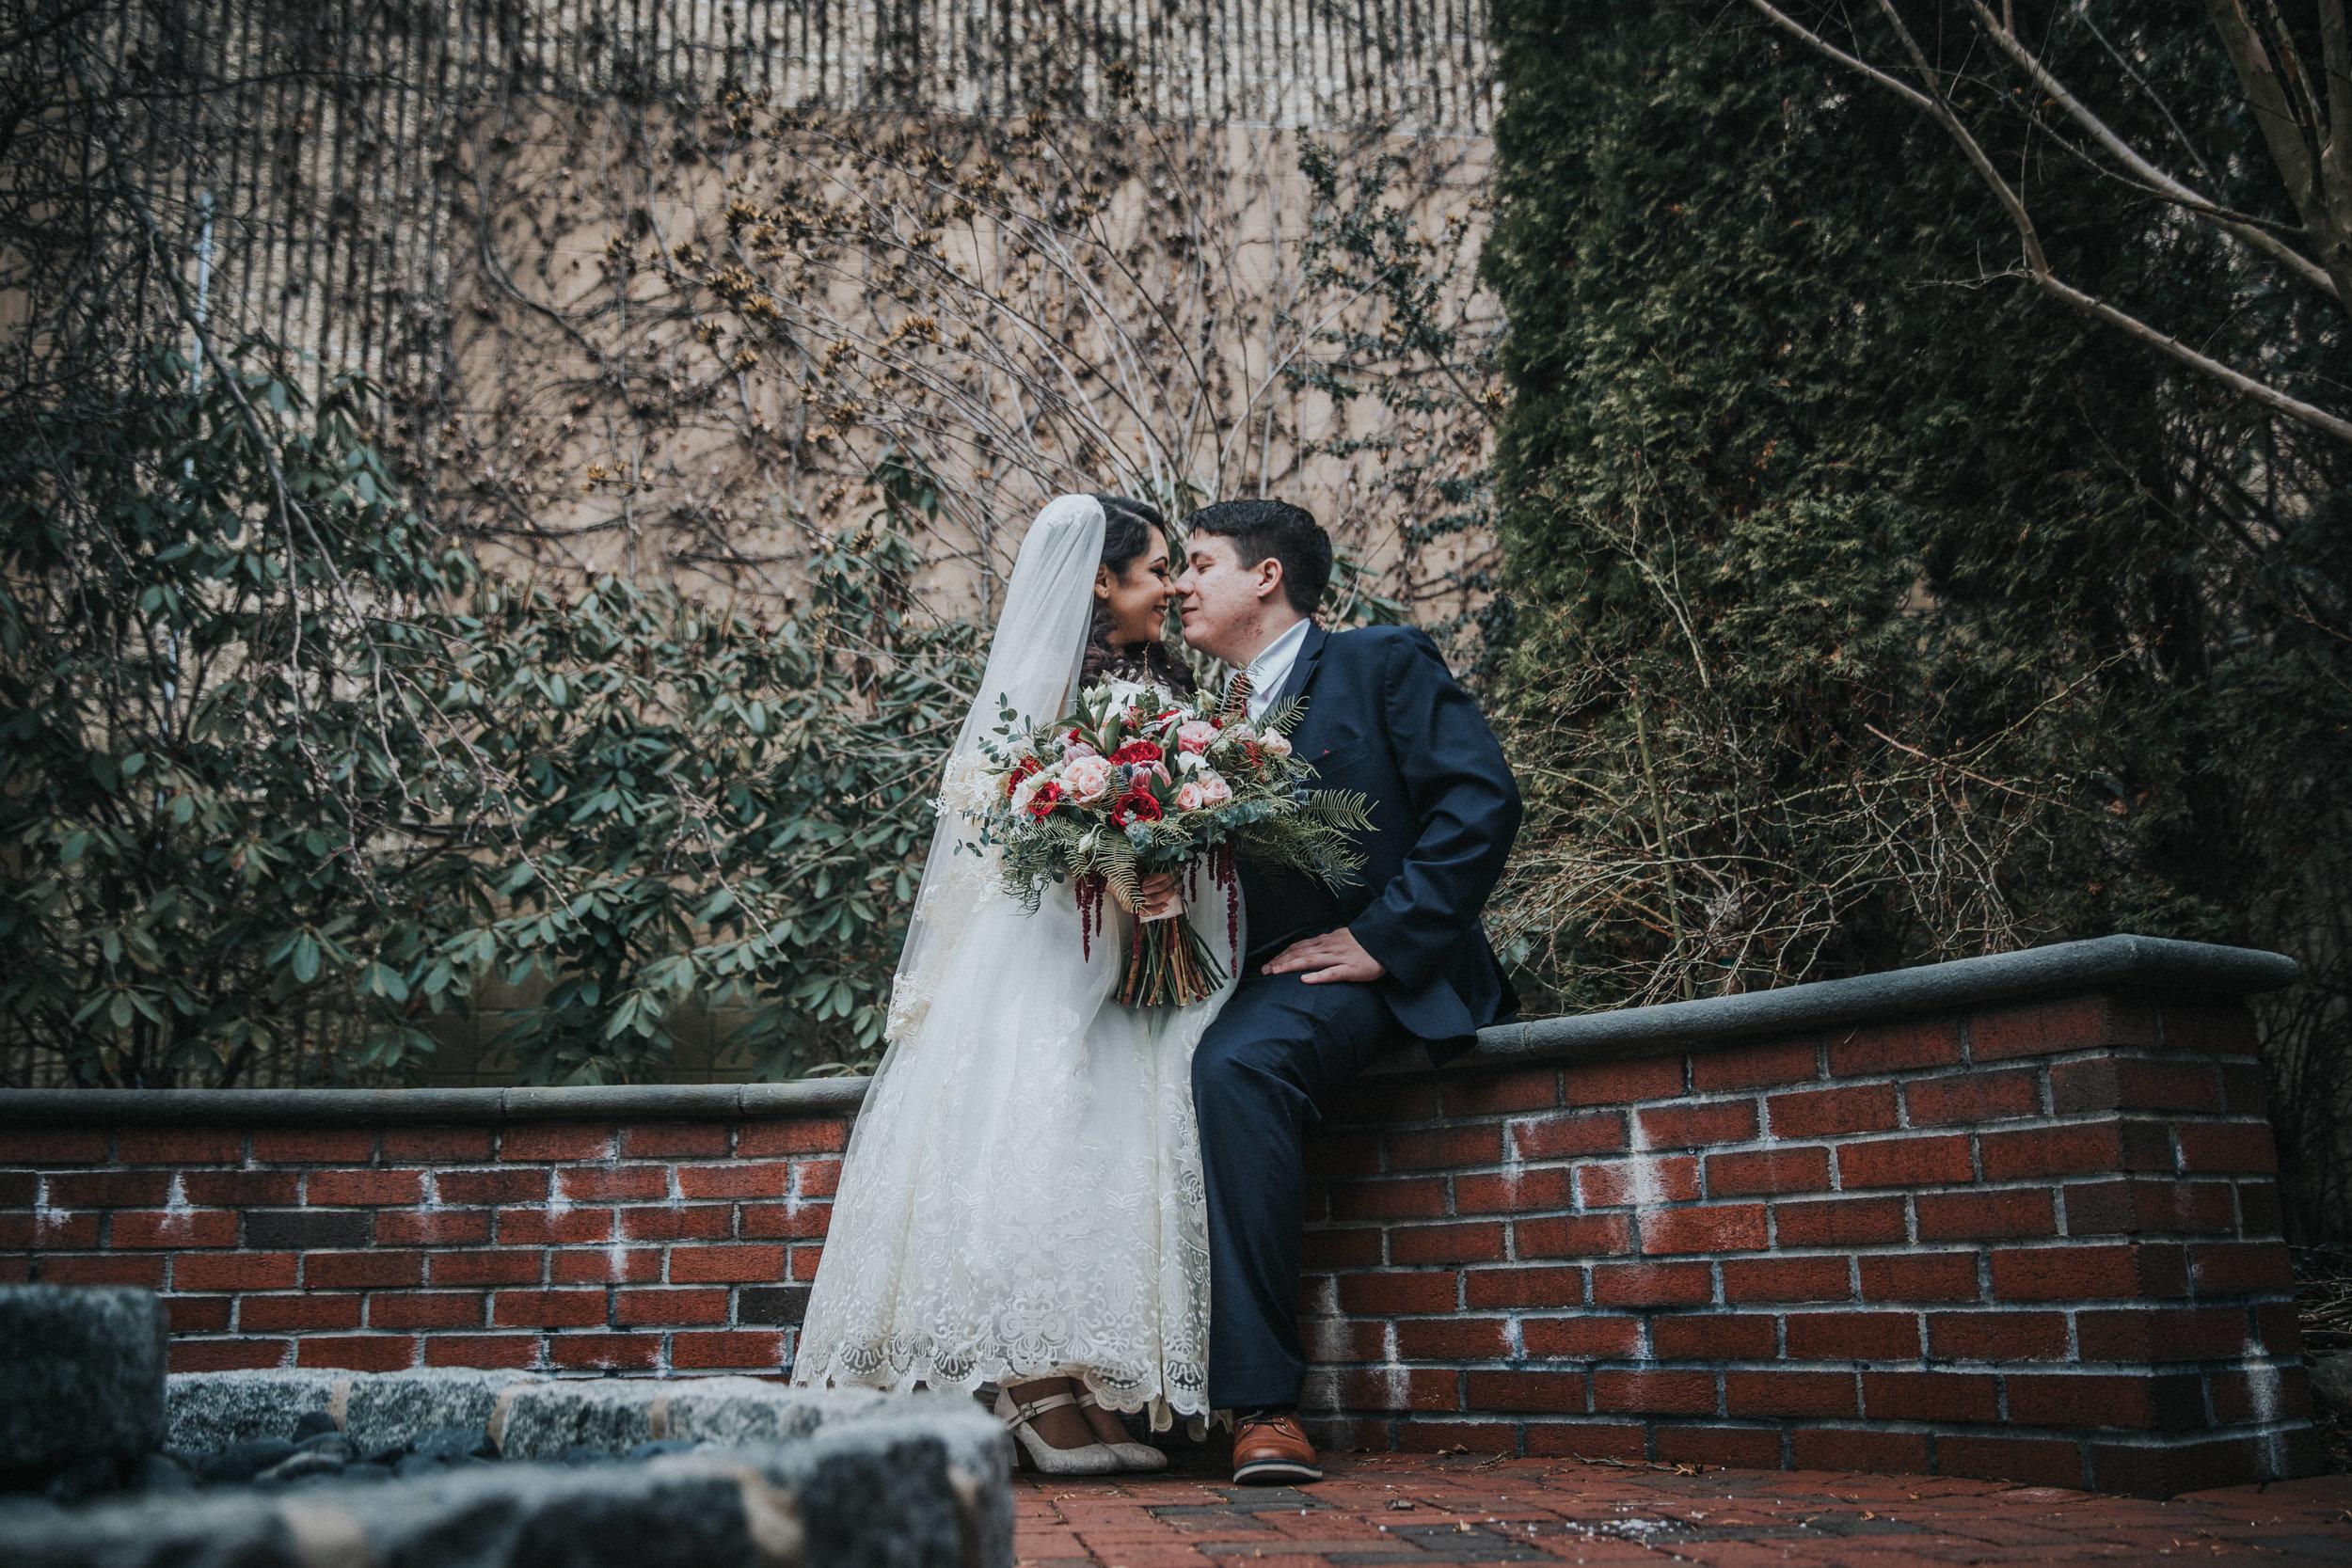 New-Jersey-Wedding-Photographer-ReceptionCenter-Valeria&Mike-First-Look-Bride&Groom (66 of 69).jpg